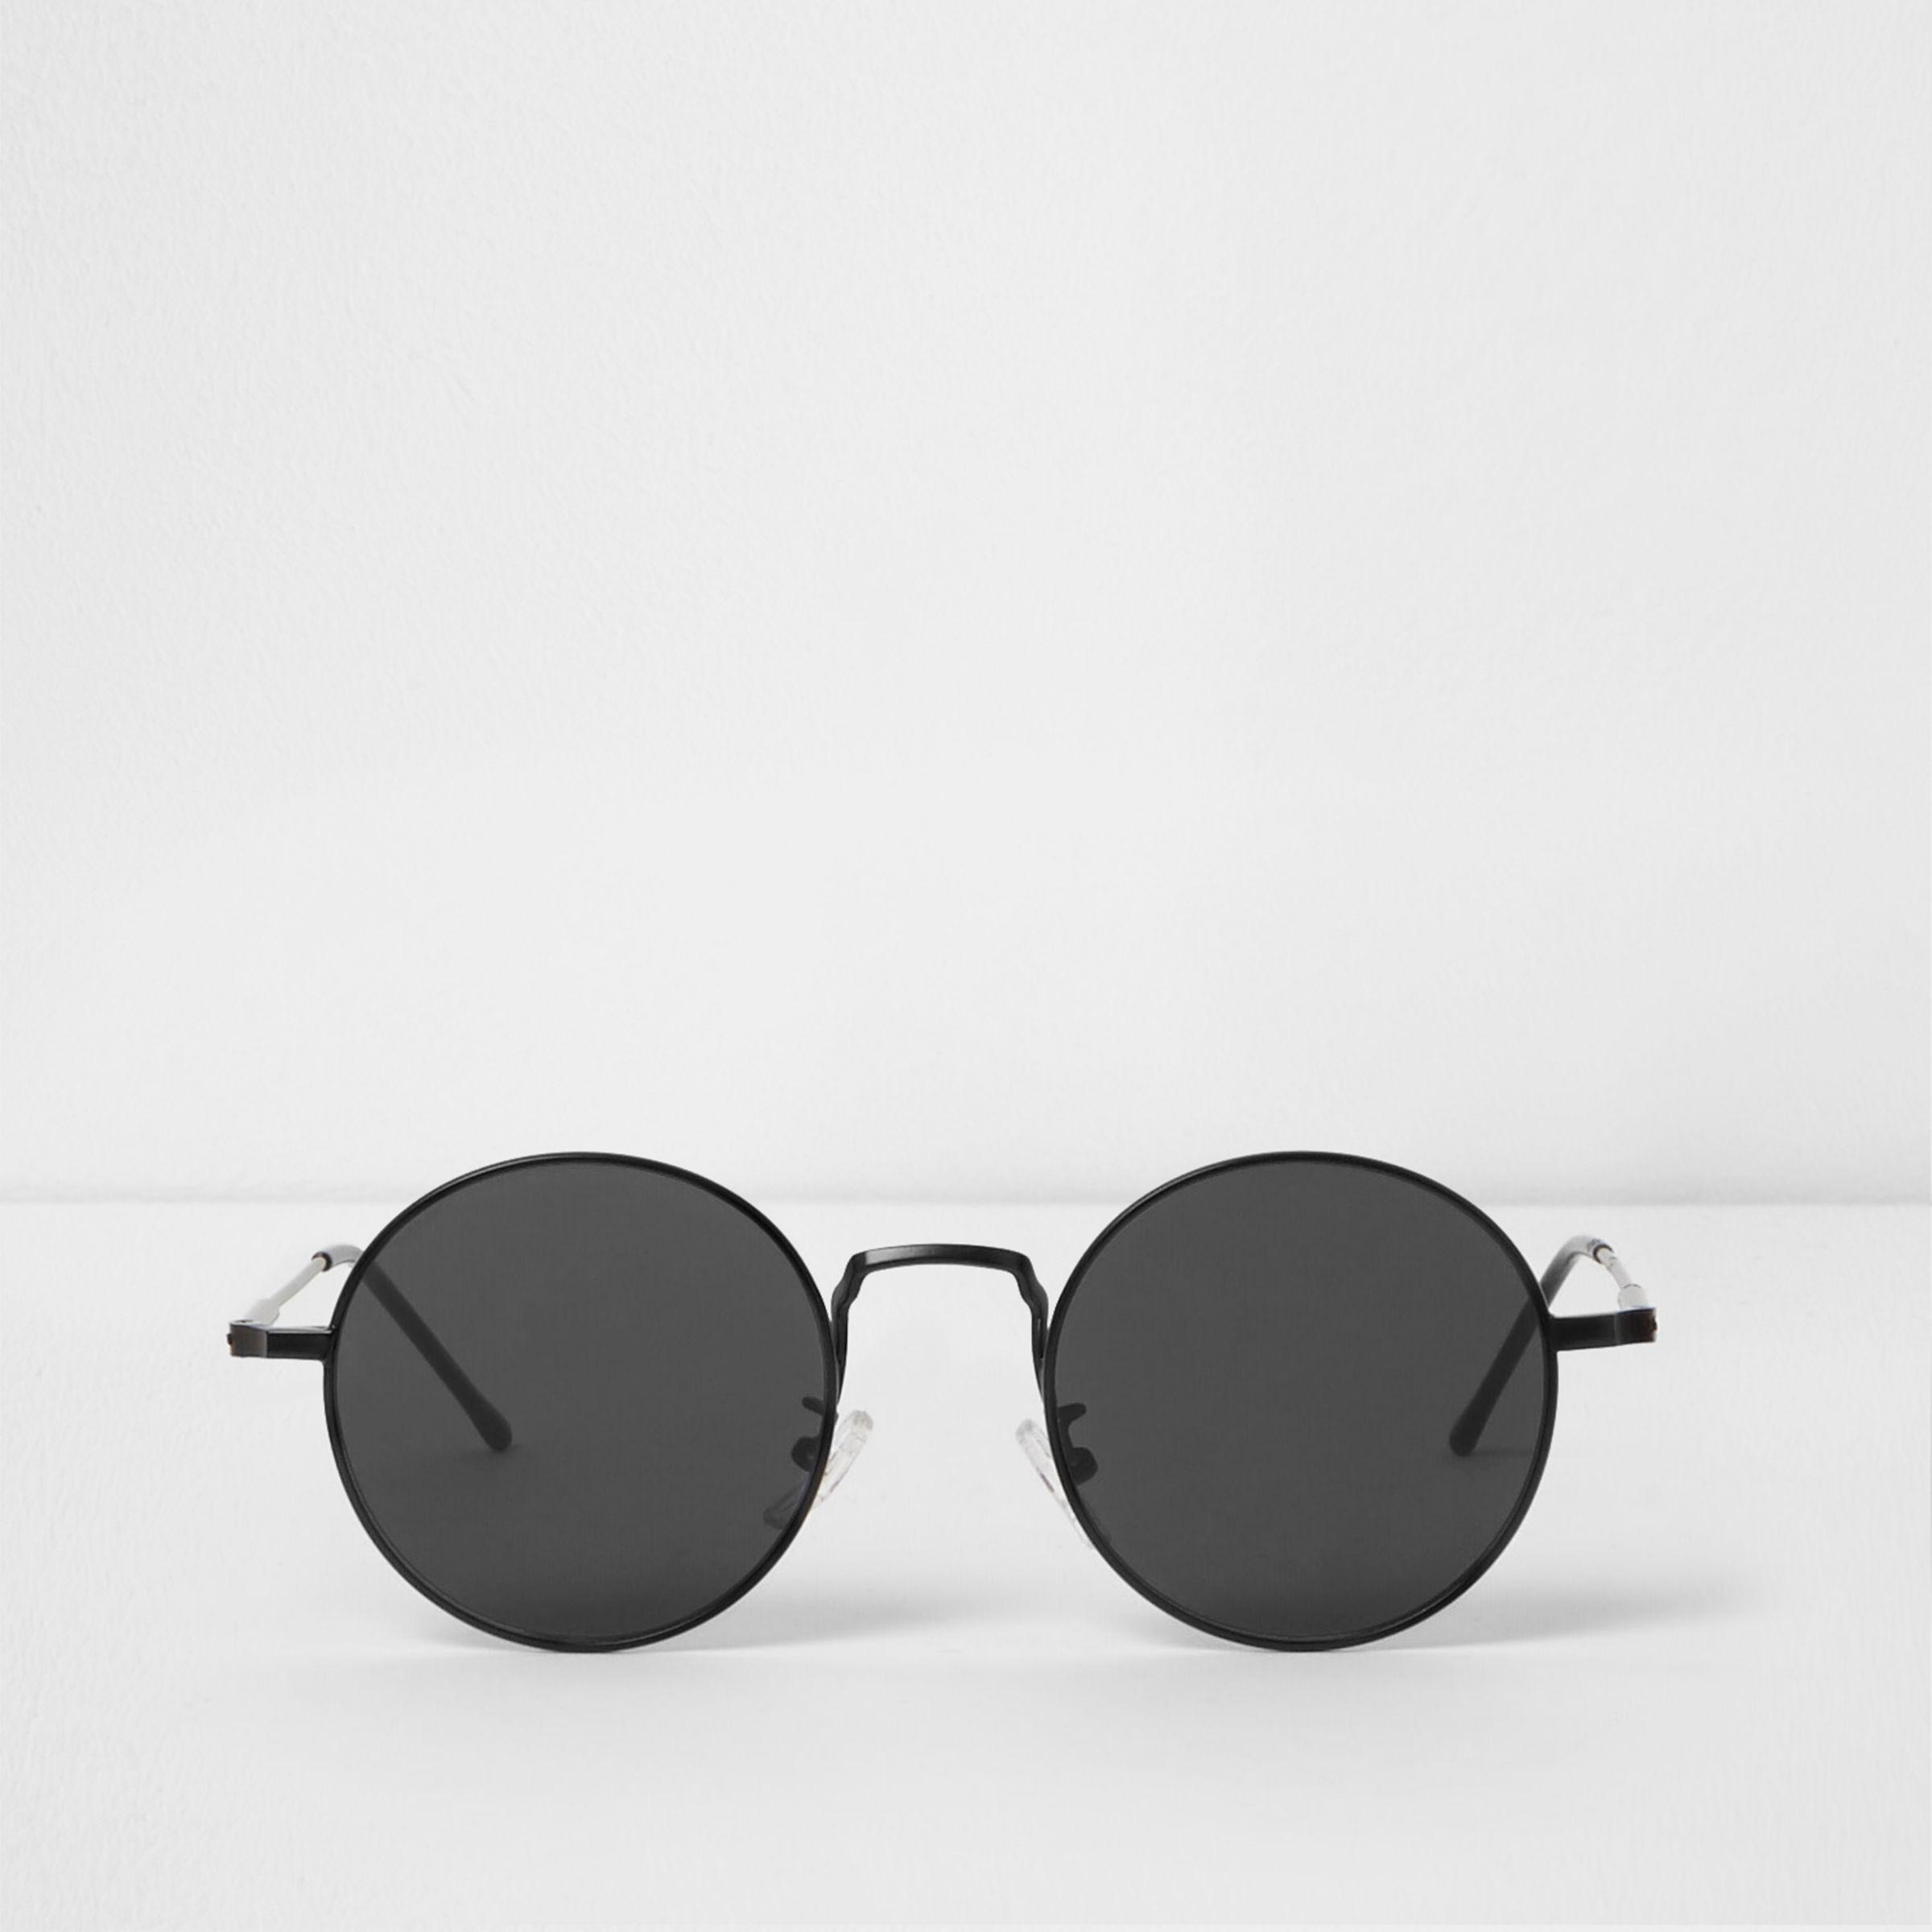 c30fb9b7af River Island Round Flat Lenses Retro Sunglasses in Black for Men - Lyst